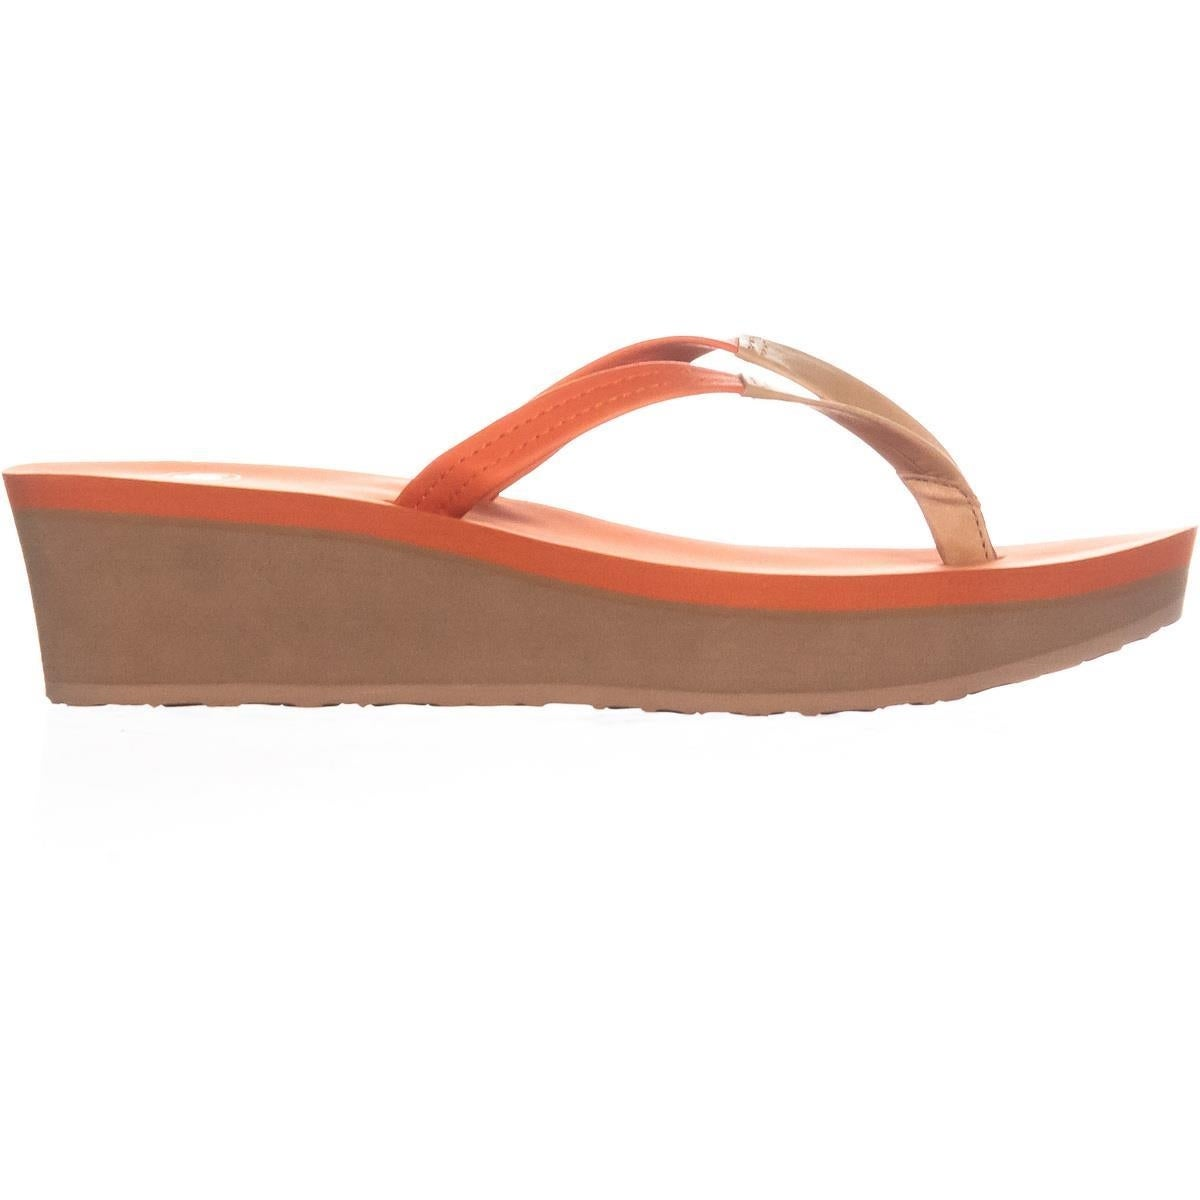 e41fe172f001 Shop UGG Australia Ruby Wedge Flip Flop Sandals